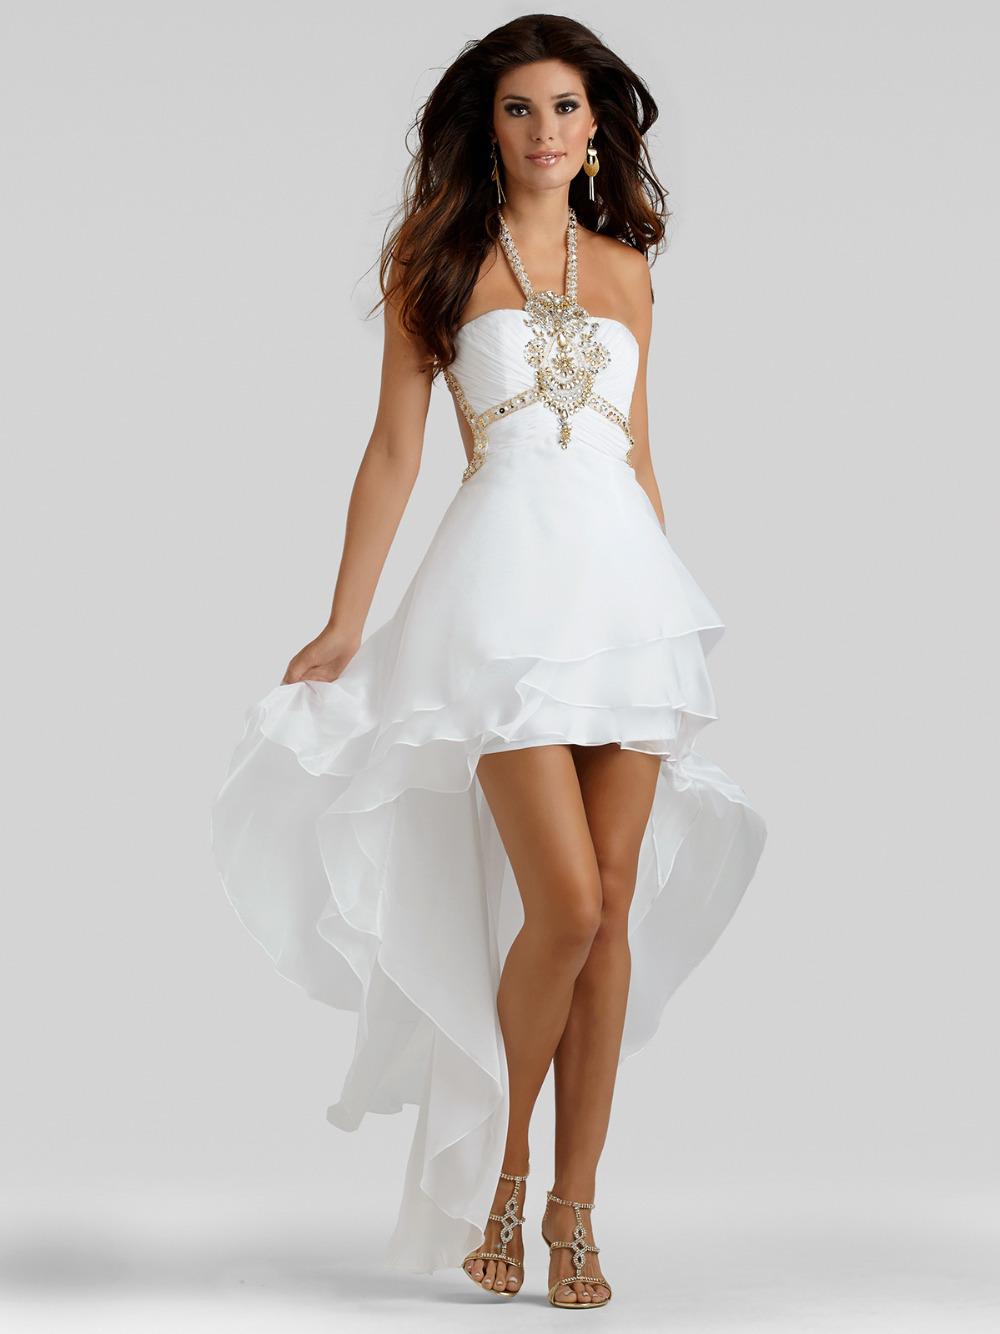 Women's Long Sexy Halter Evening Wedding Bridesmaid Prom ...  |Halter Cocktail Dresses